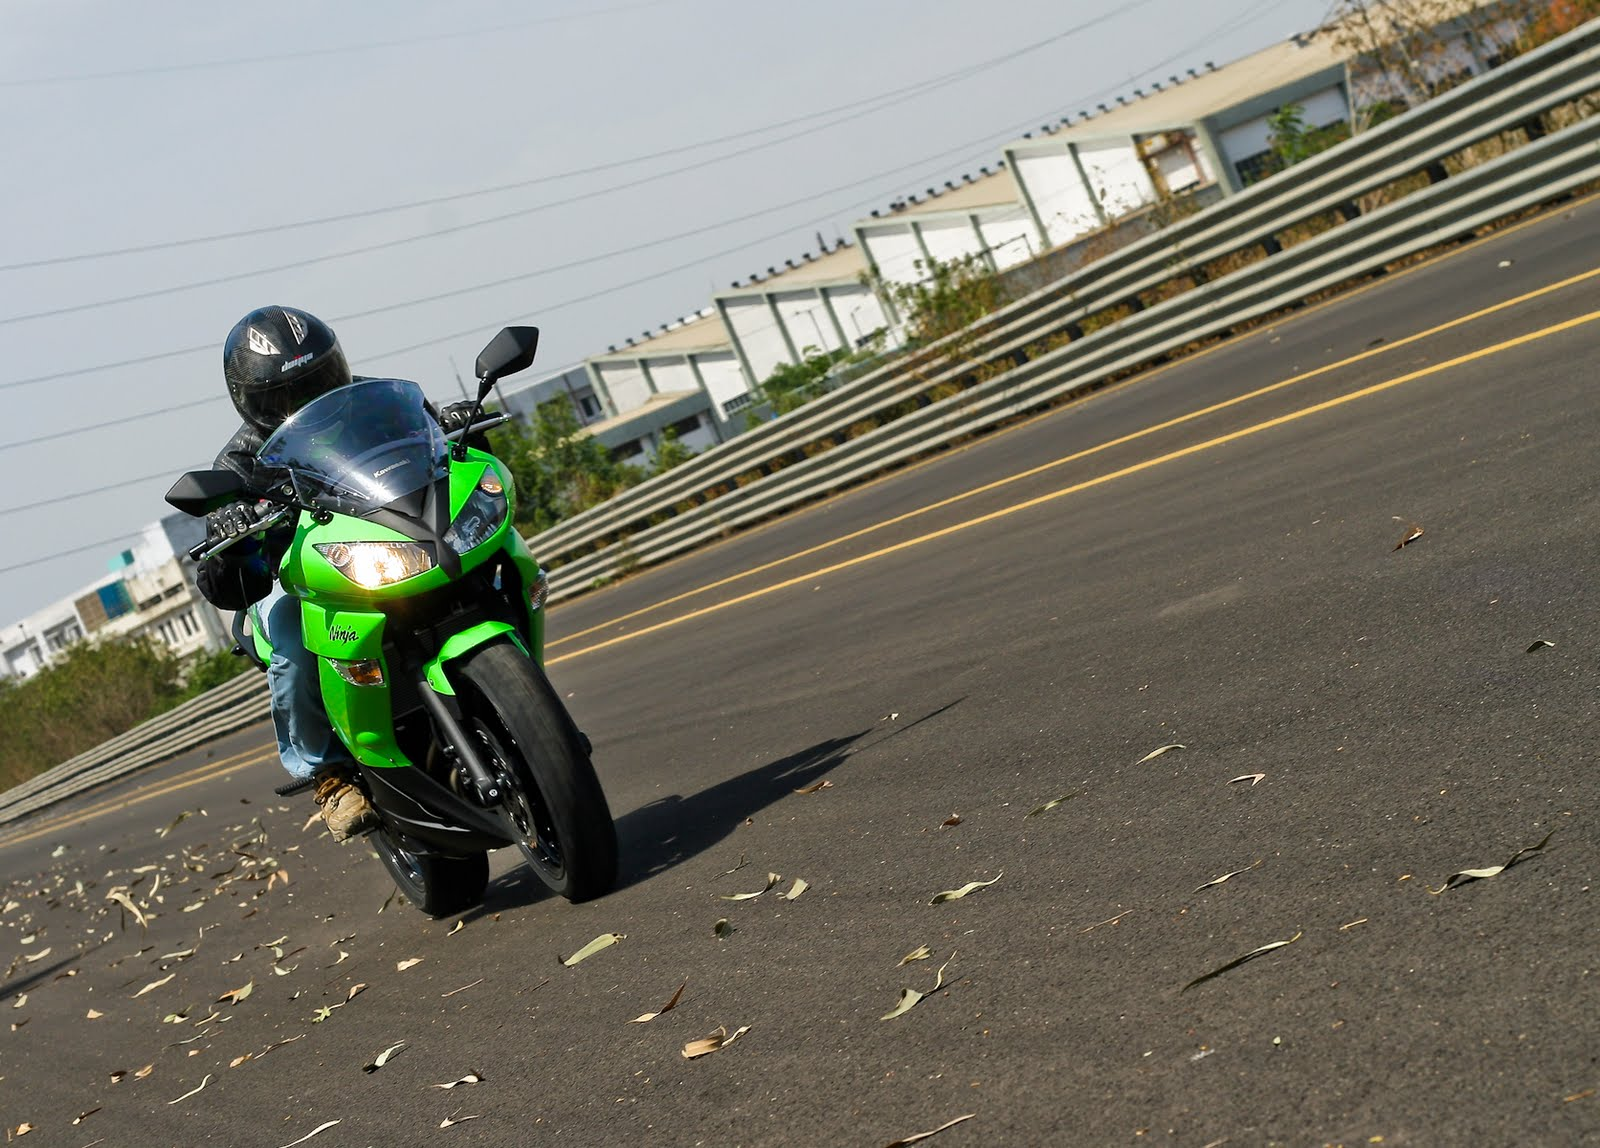 2011 Kawasaki Ninja 650R